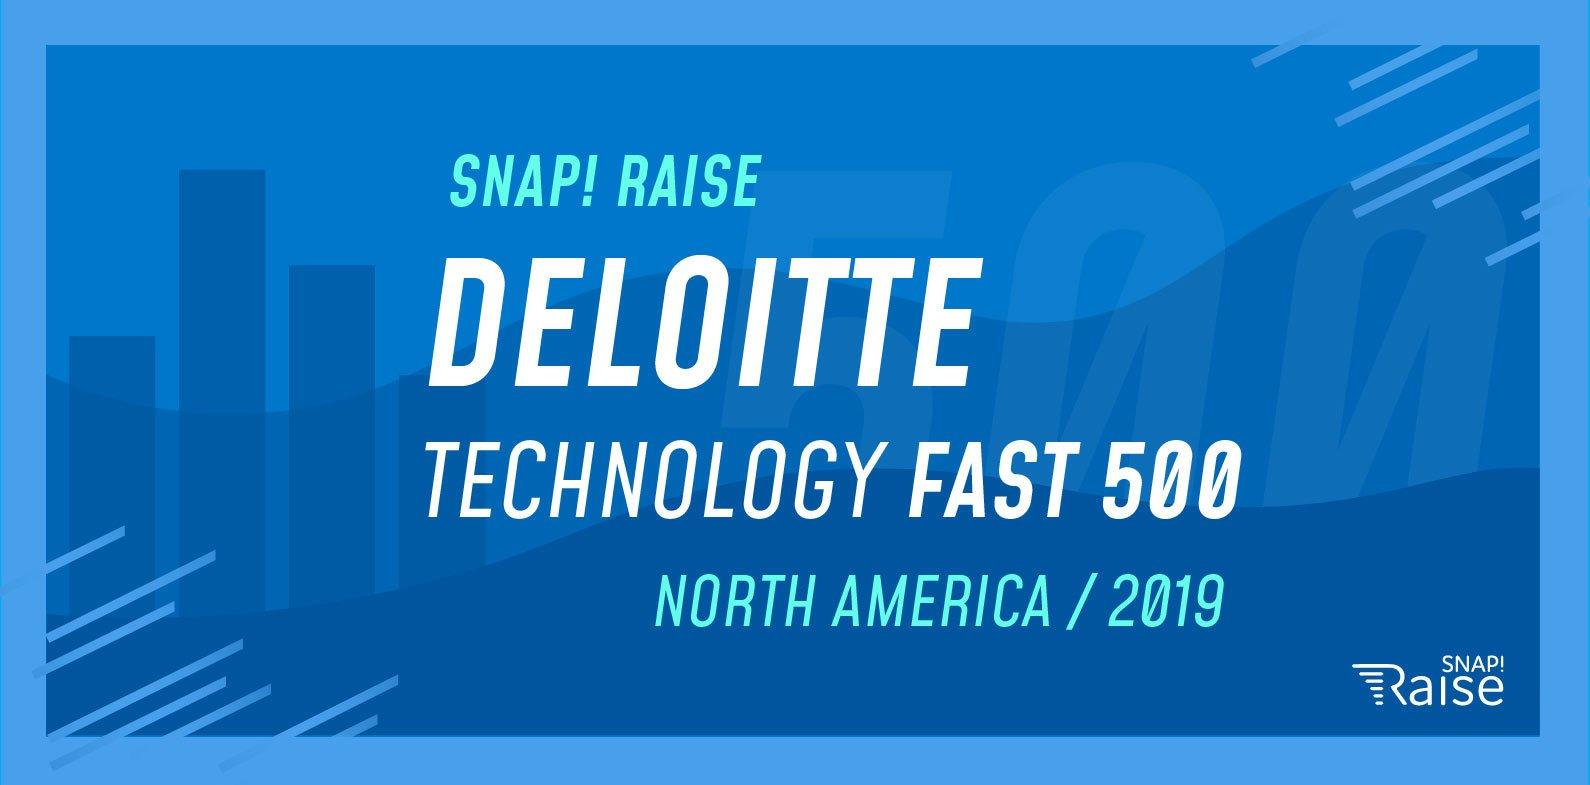 Deloitte-Fast-500_2019_Image-in-Blog-Post